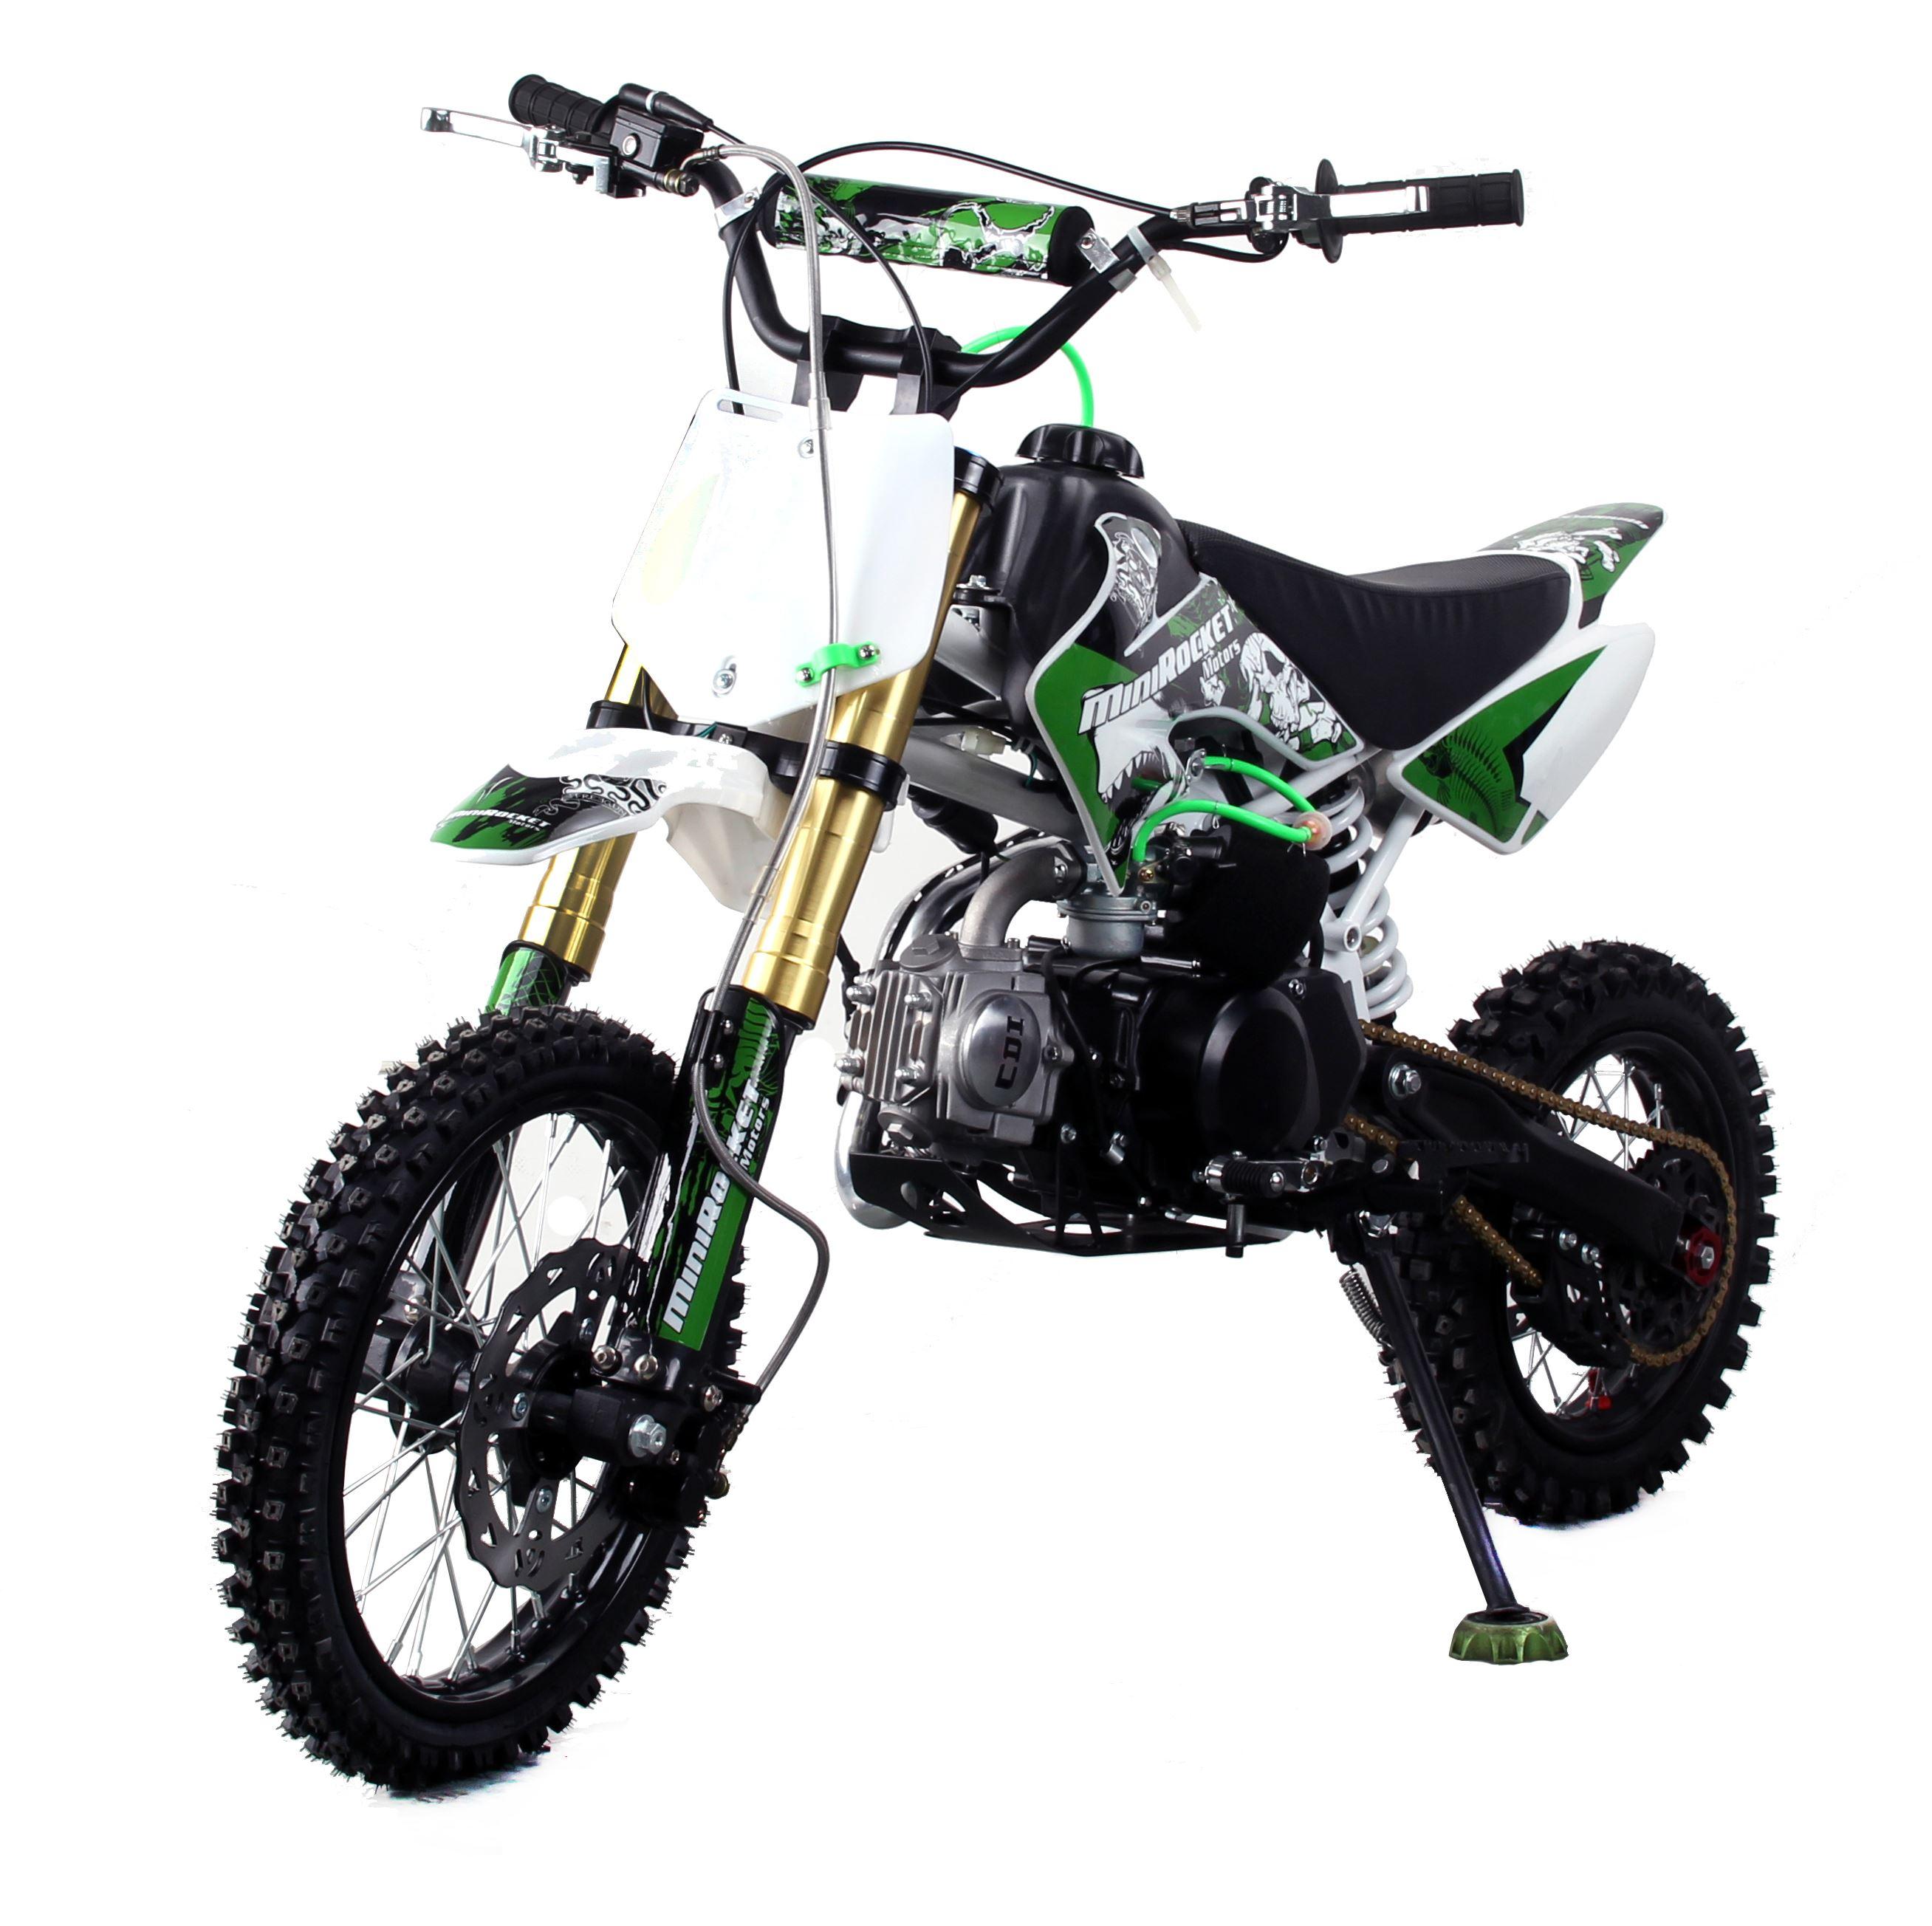 2ecf868517b56 Pitbike MiniRocket Motors CRF50 125ccm, zelené | ATV, štvorkolky ...